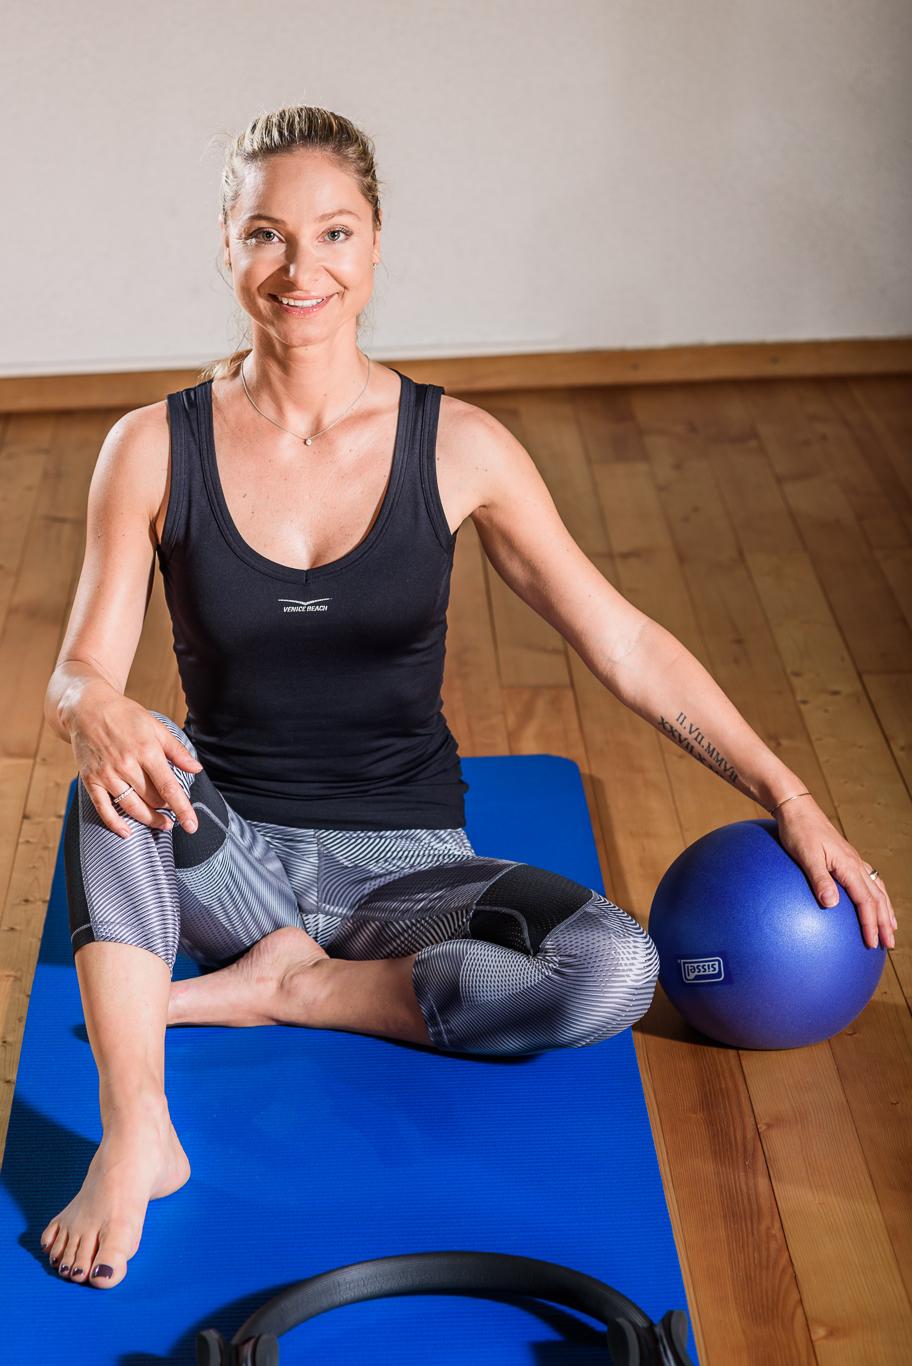 2017 06 28 Pilates Studio Silvia Rellstab-108